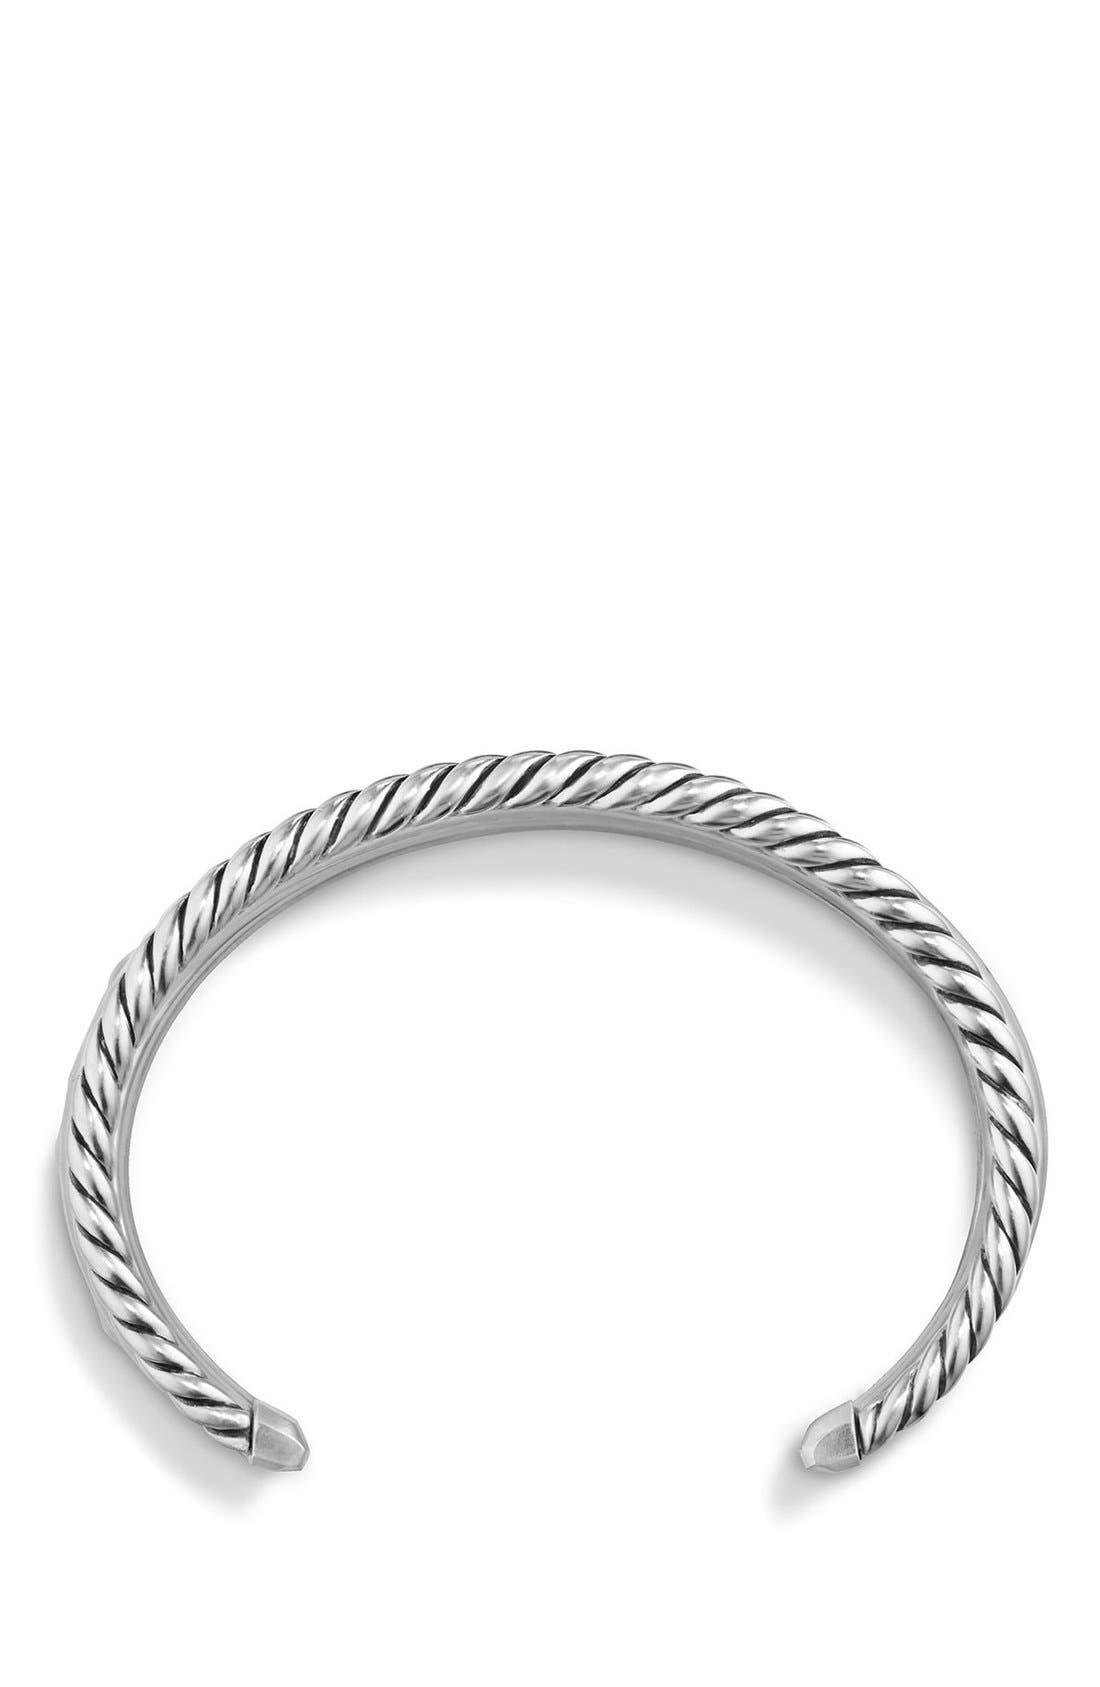 Alternate Image 2  - David Yurman 'Stax' Wide Cuff Bracelet with Diamonds